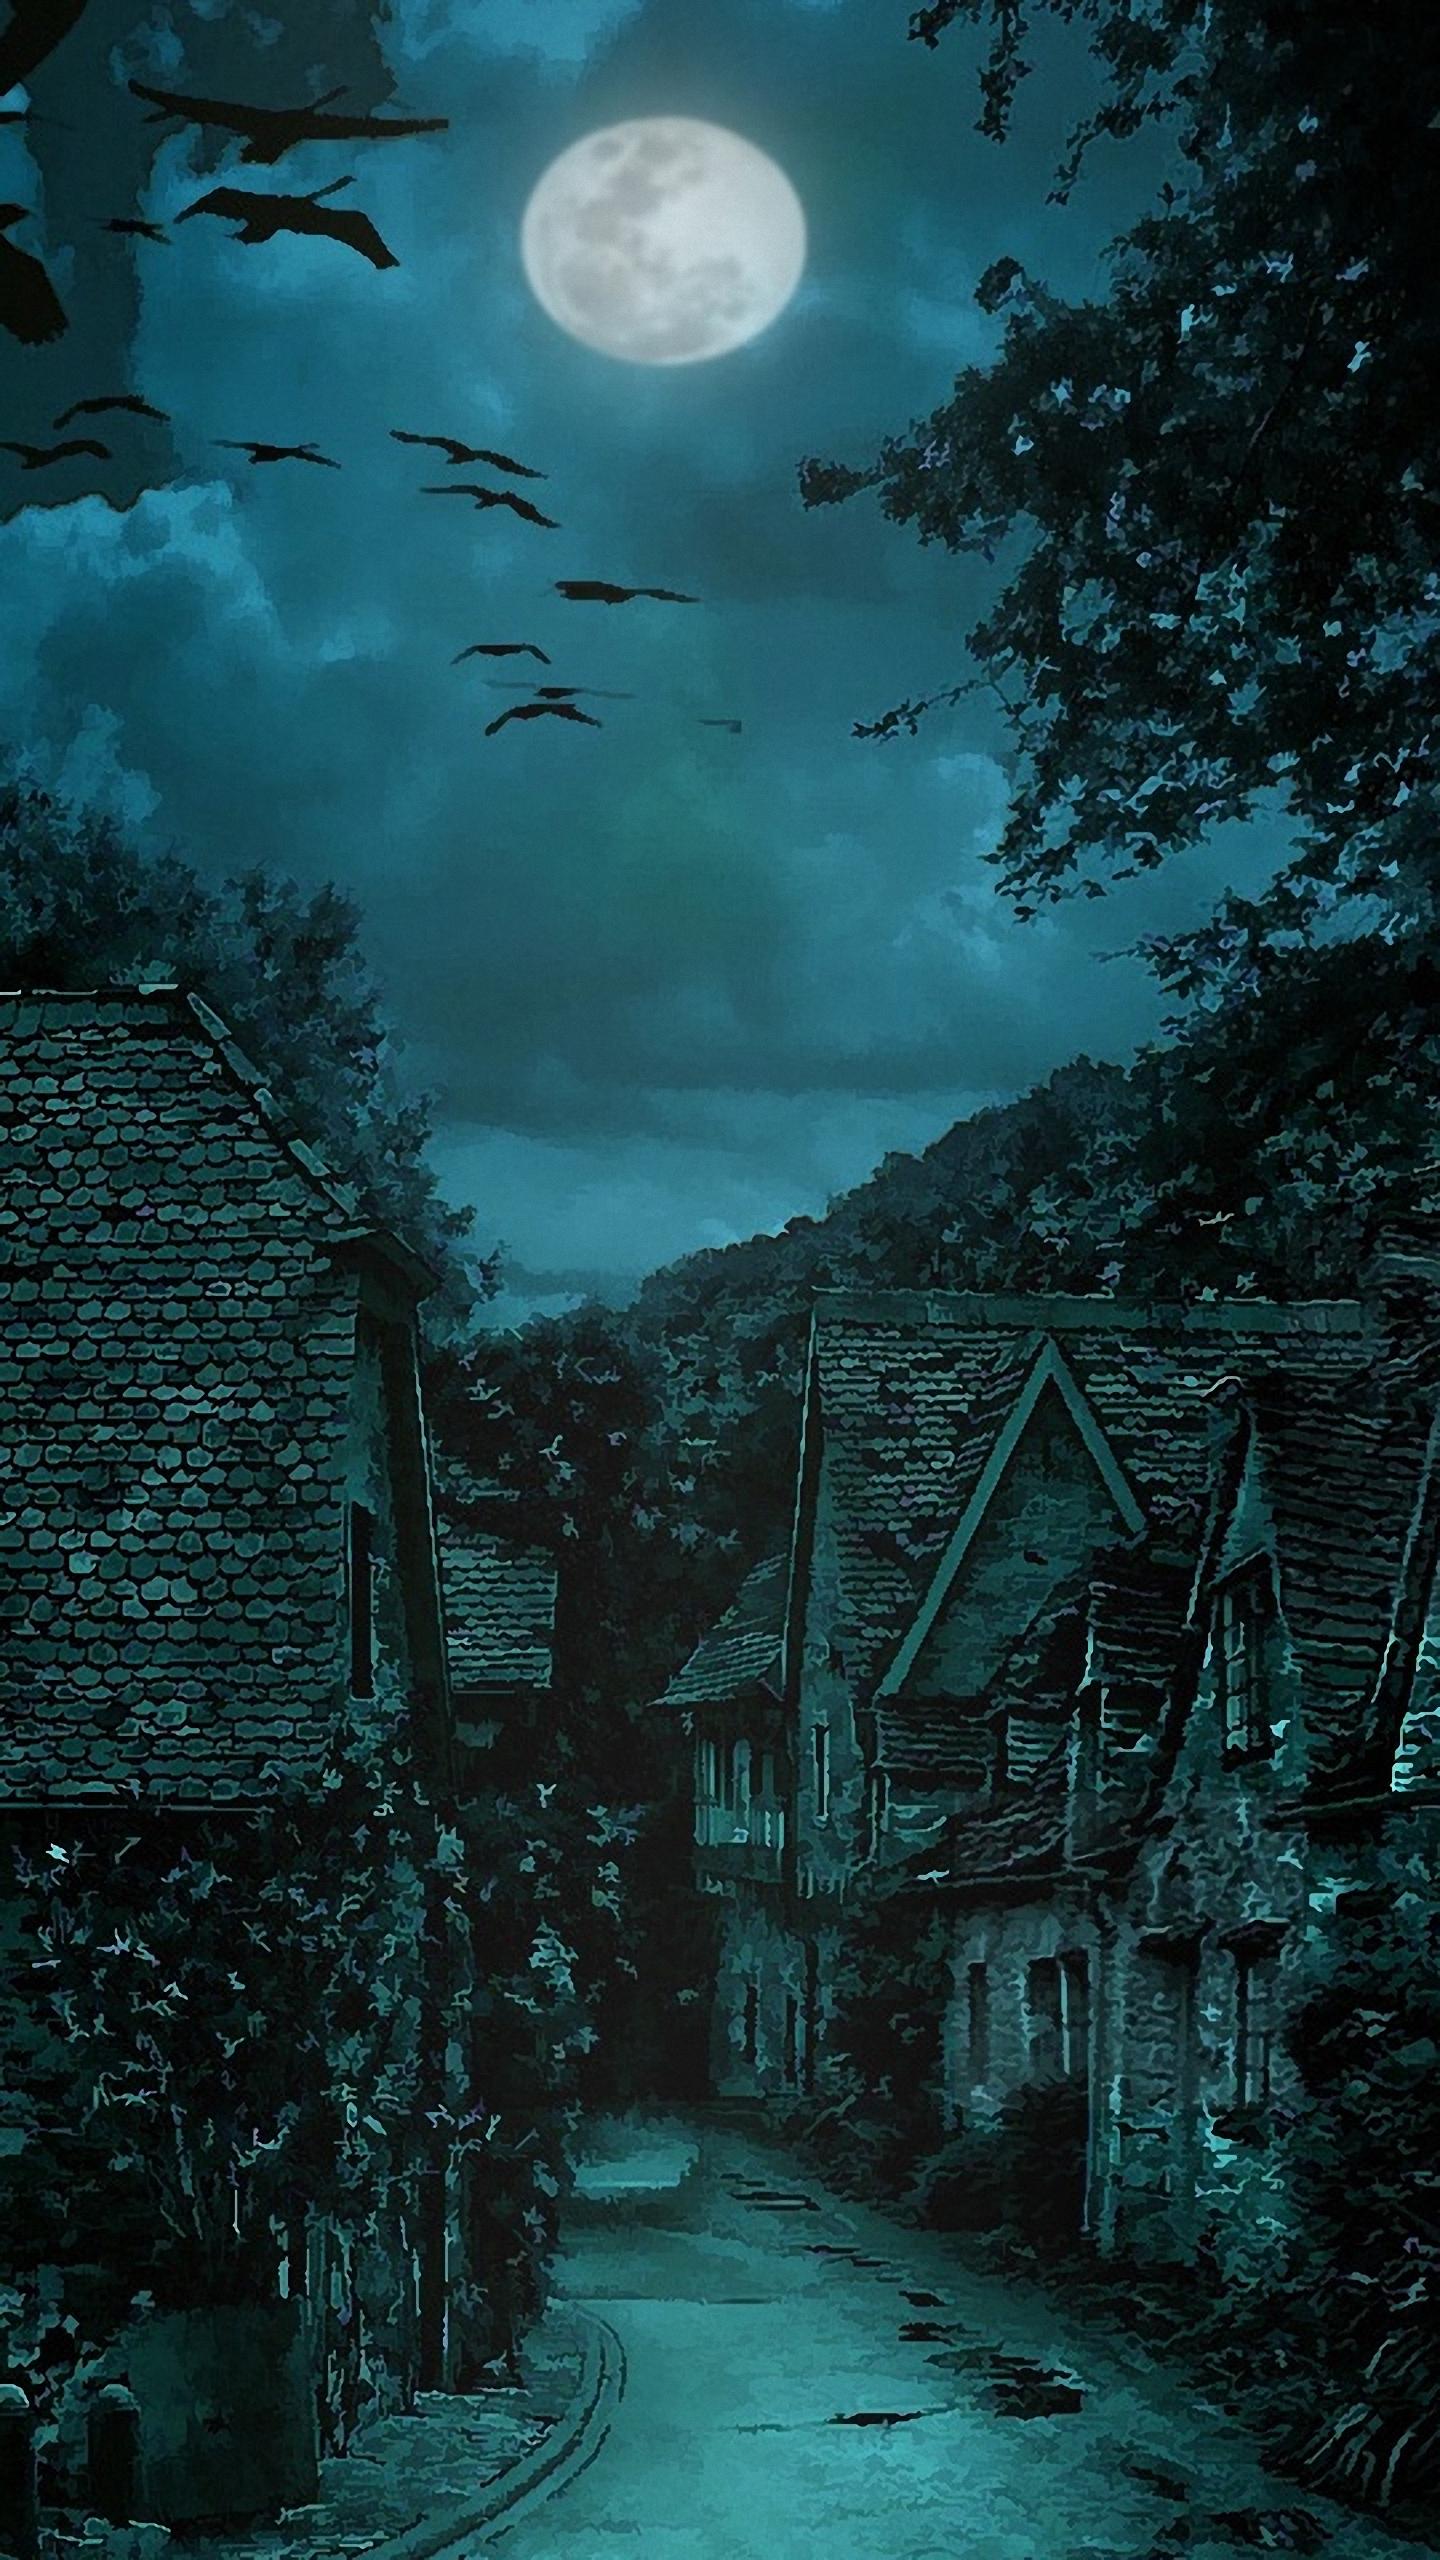 Cute Fairy Wallpaper Download 1440 X 2560 Images For Phone Pixelstalk Net